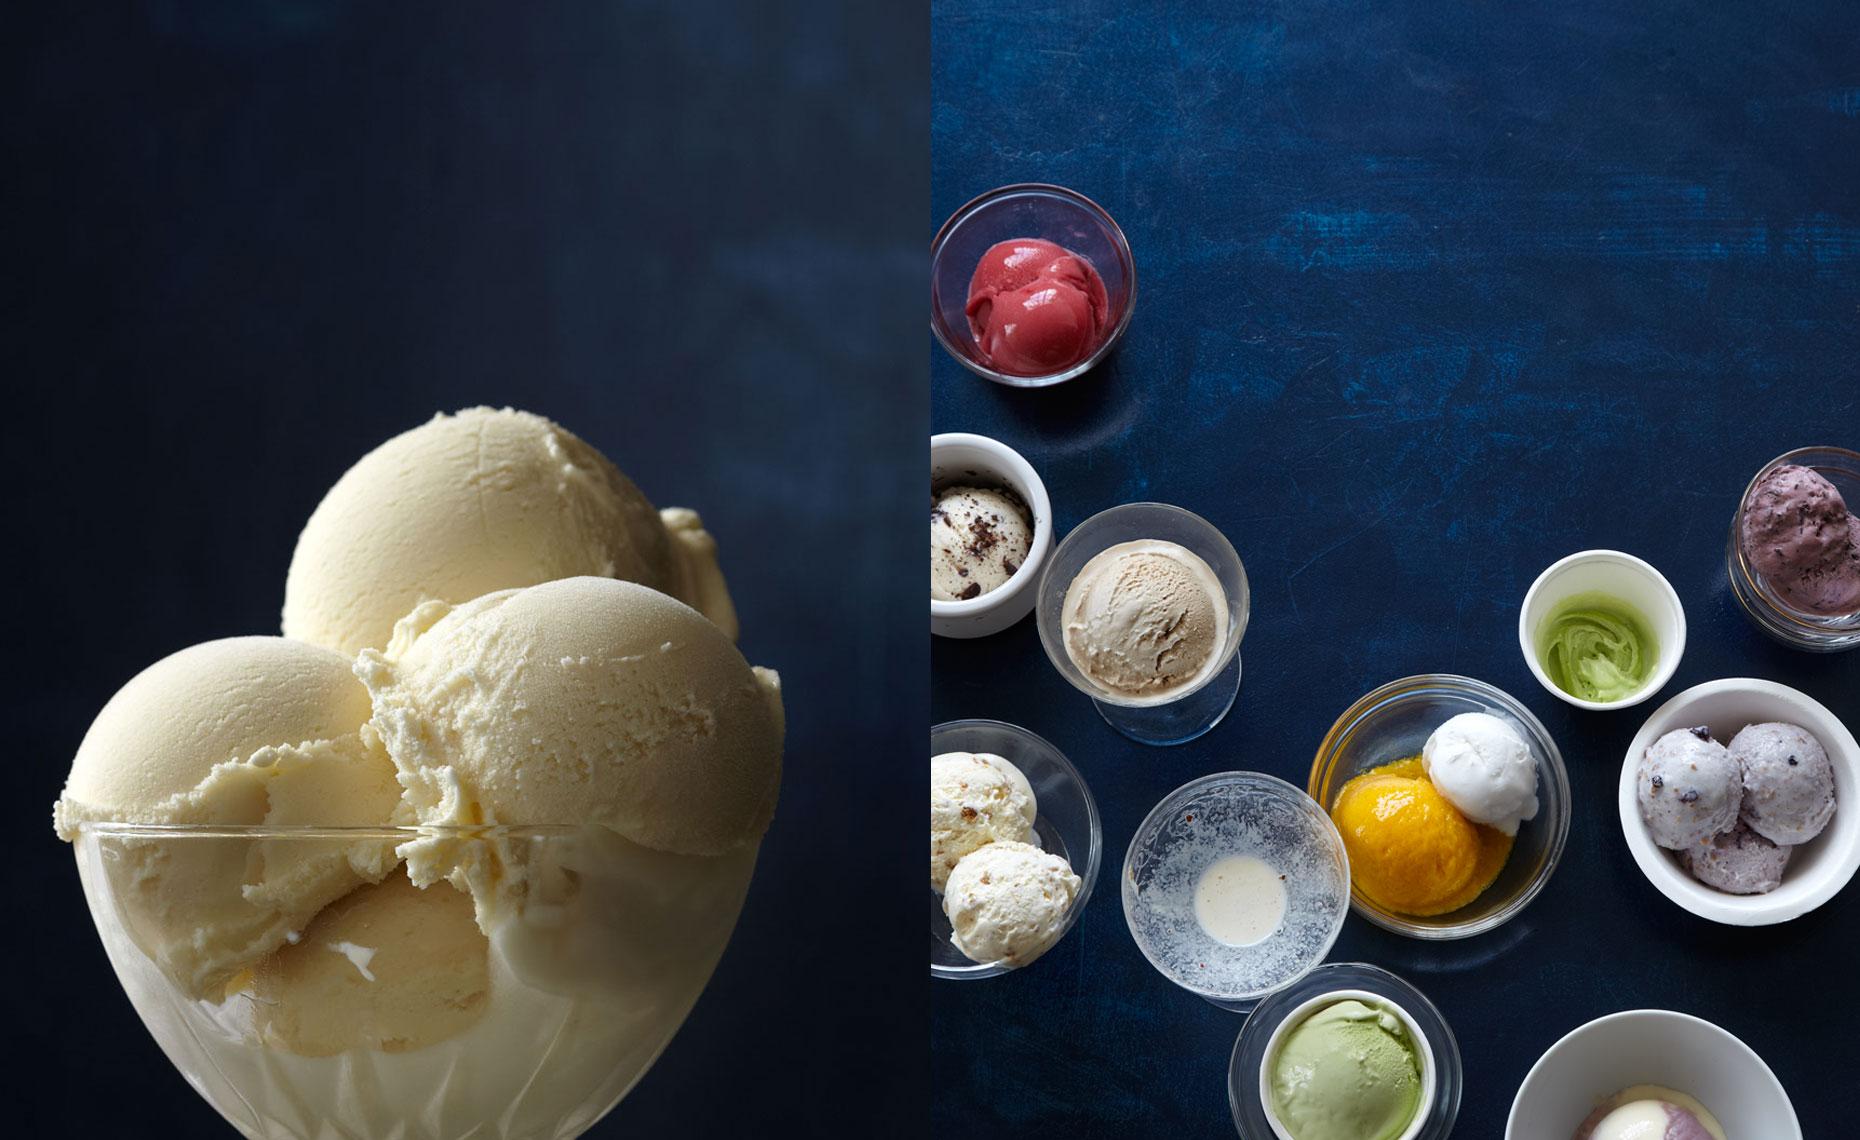 vanilla-ice-cream-and-ice-cream-bowls.jpg